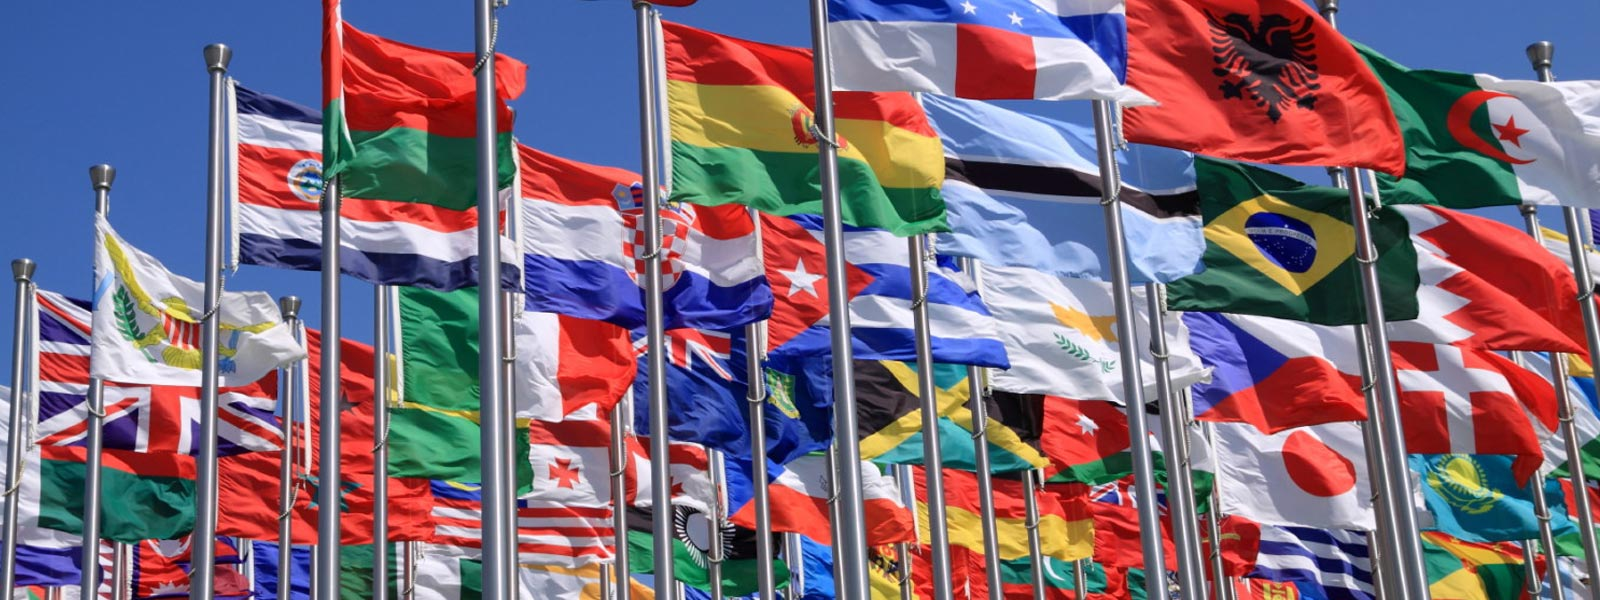 national flags flags stevenson flags